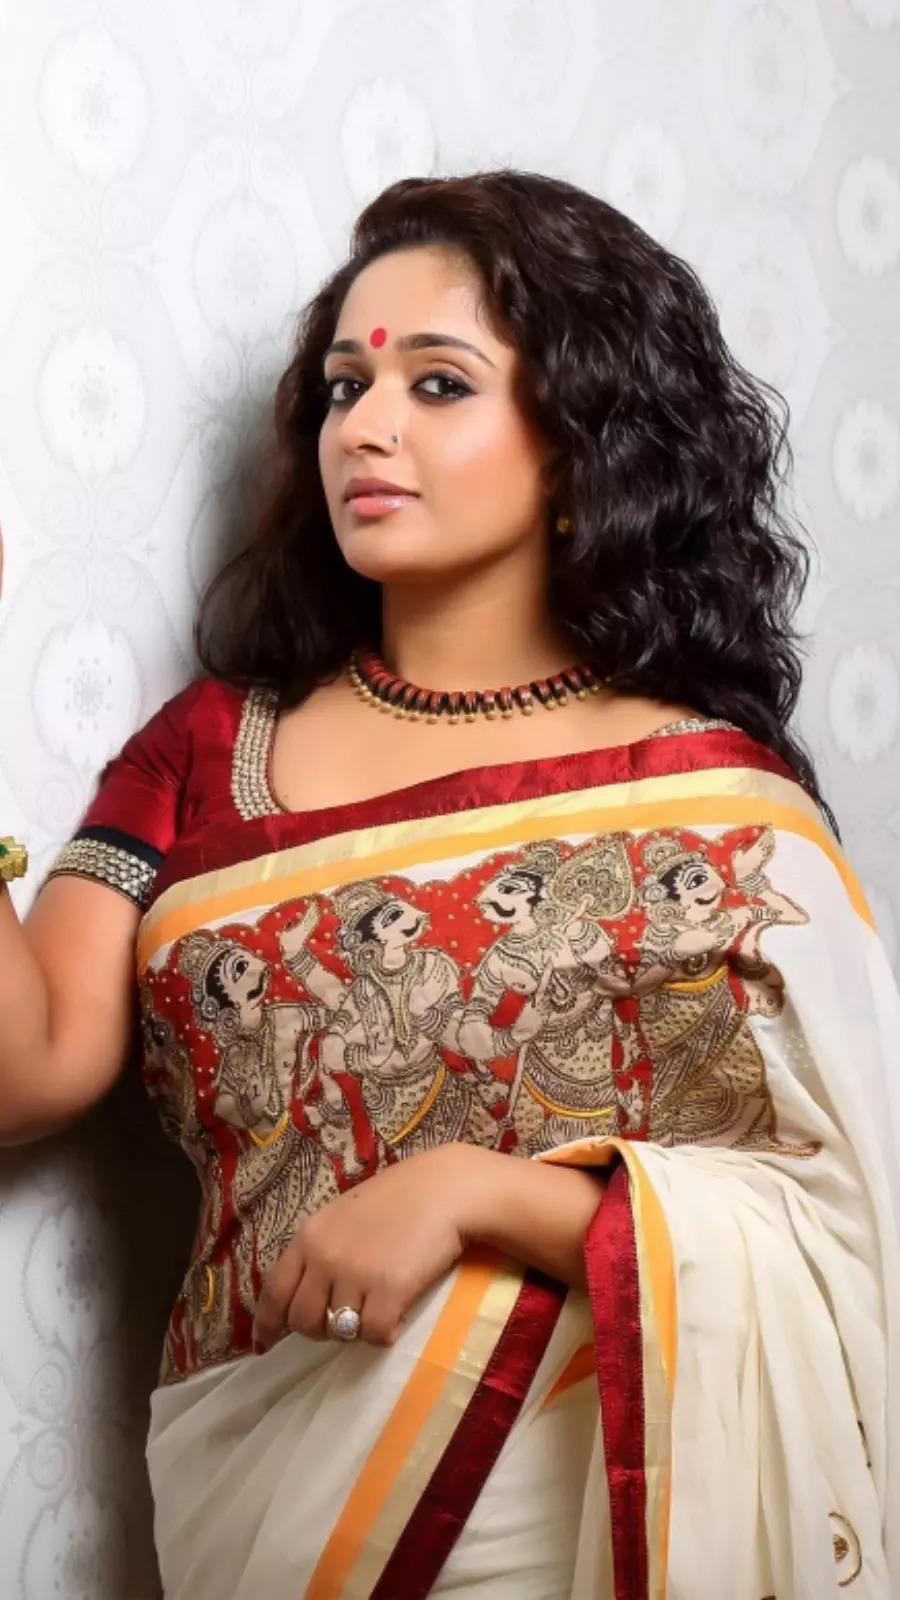 Kerala girl